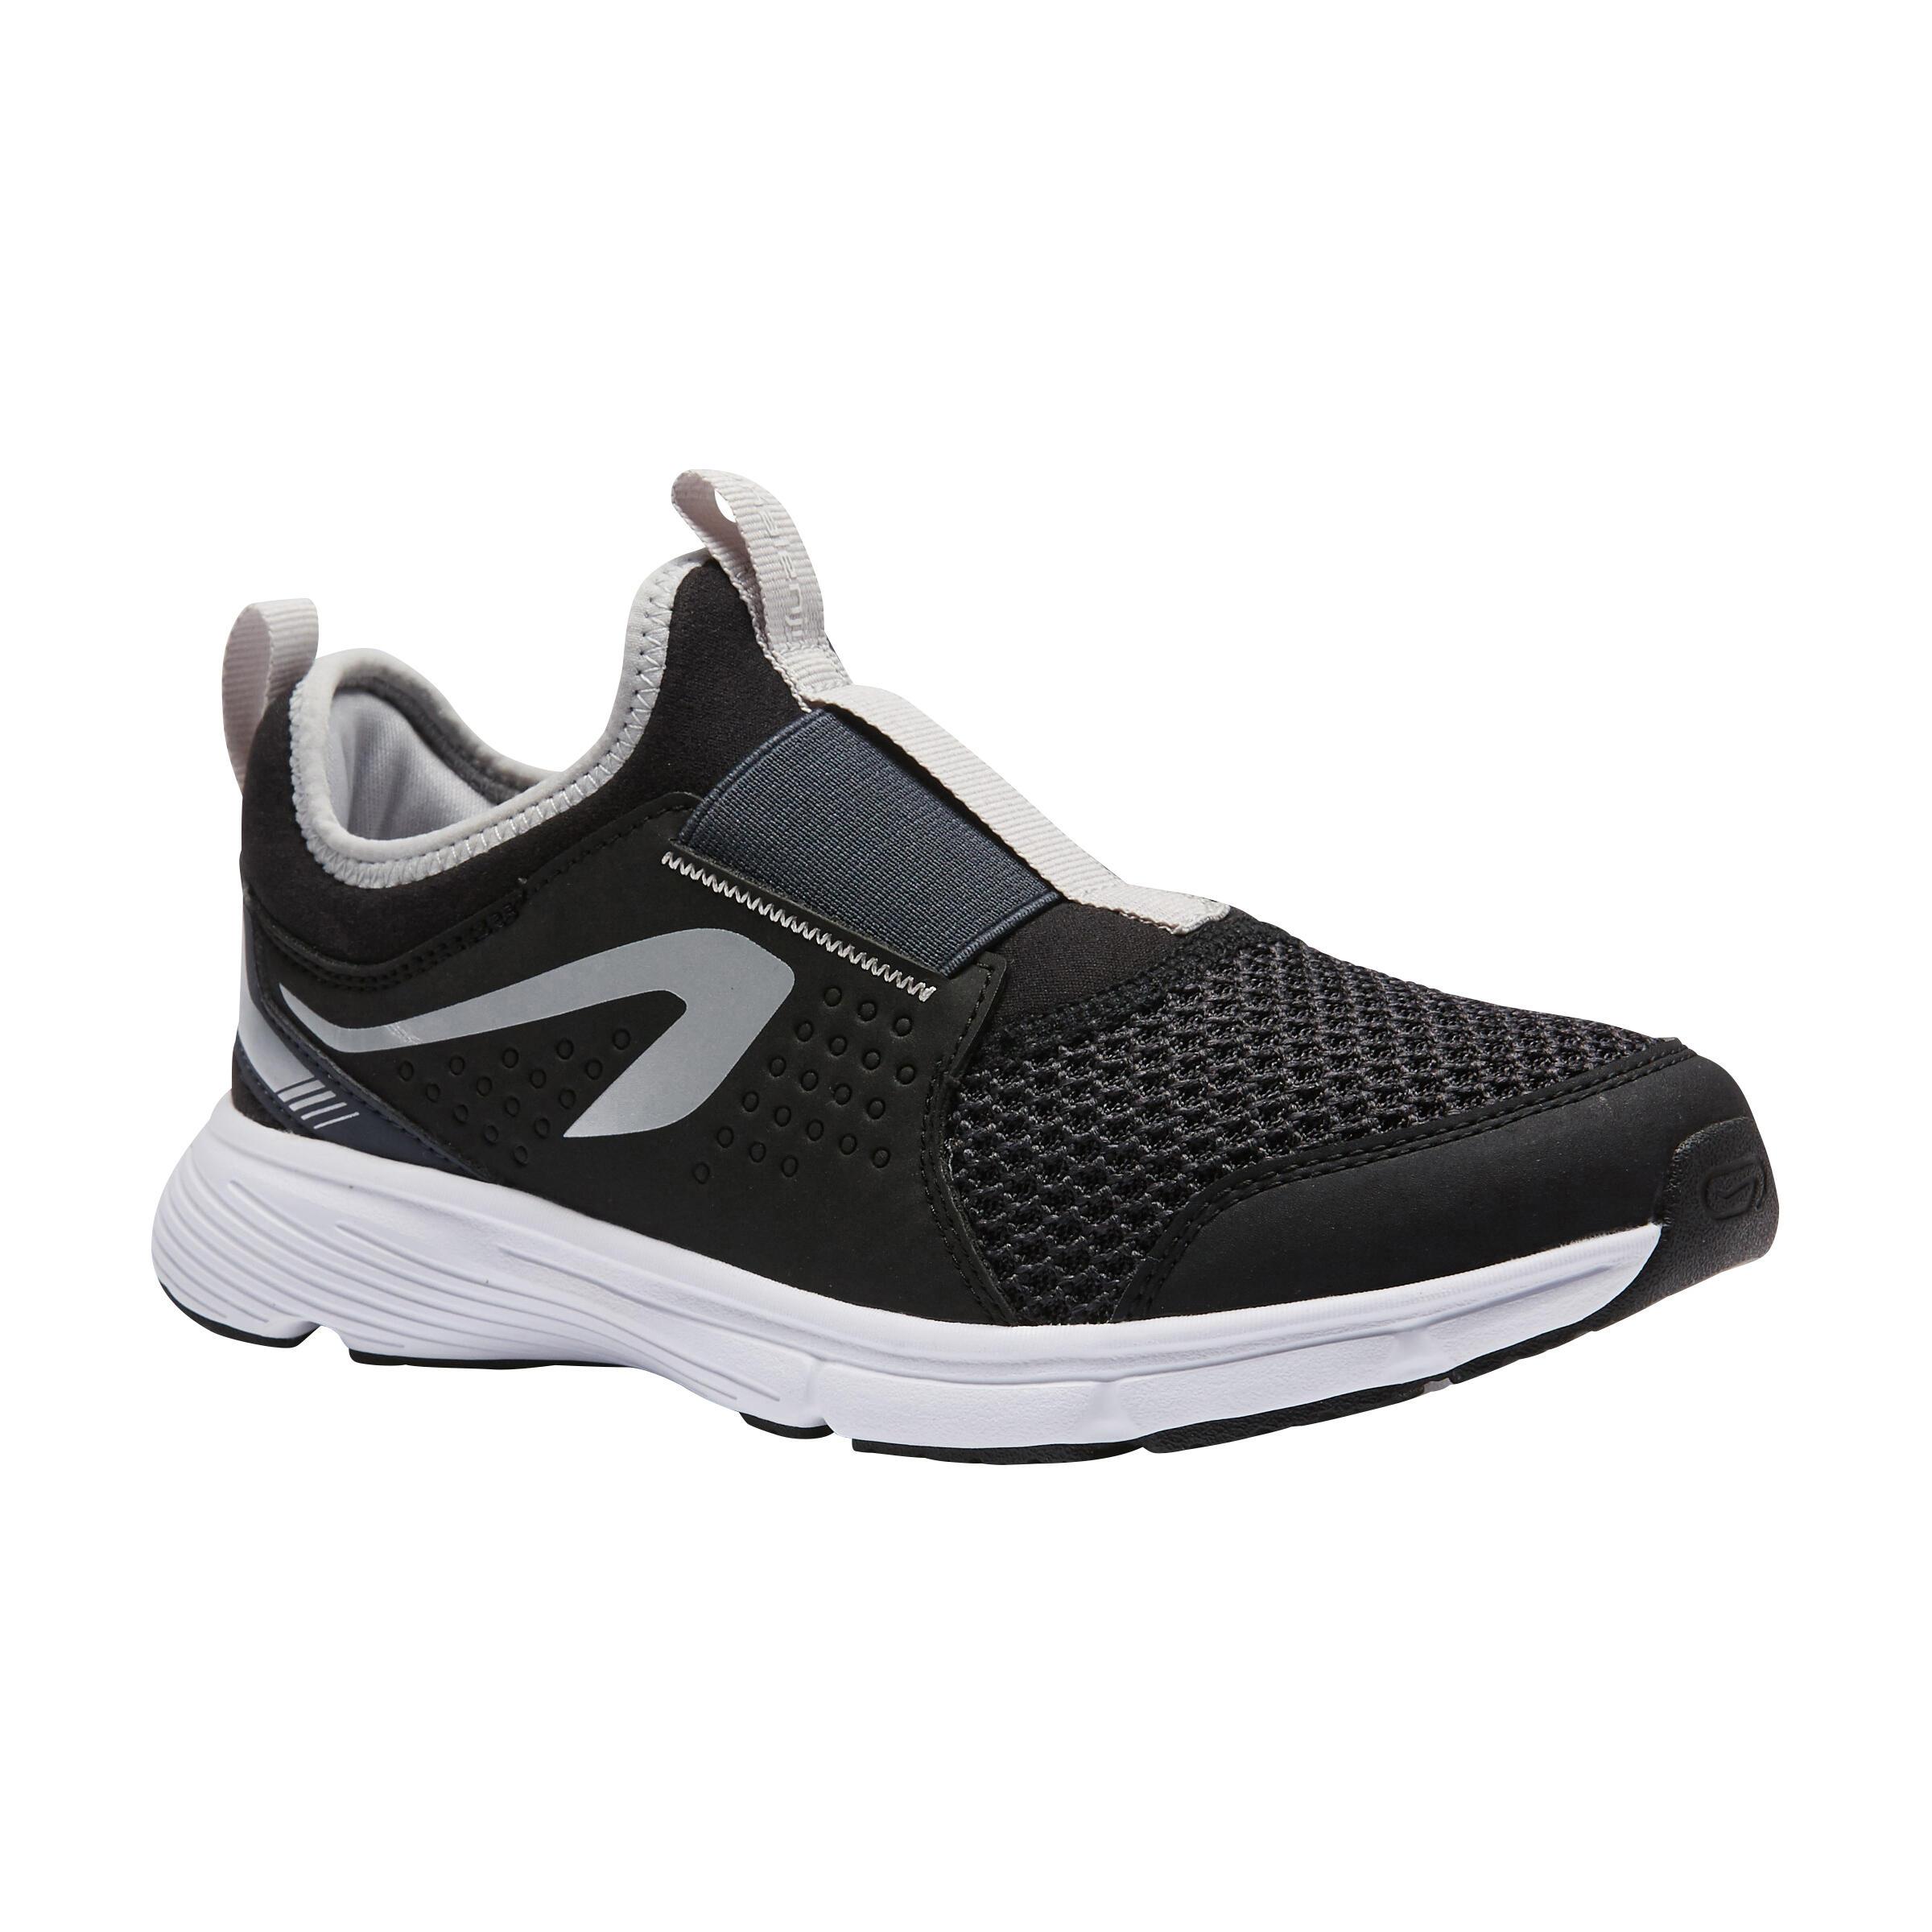 cc485c02320 Comprar Zapatillas de running para correr de niño